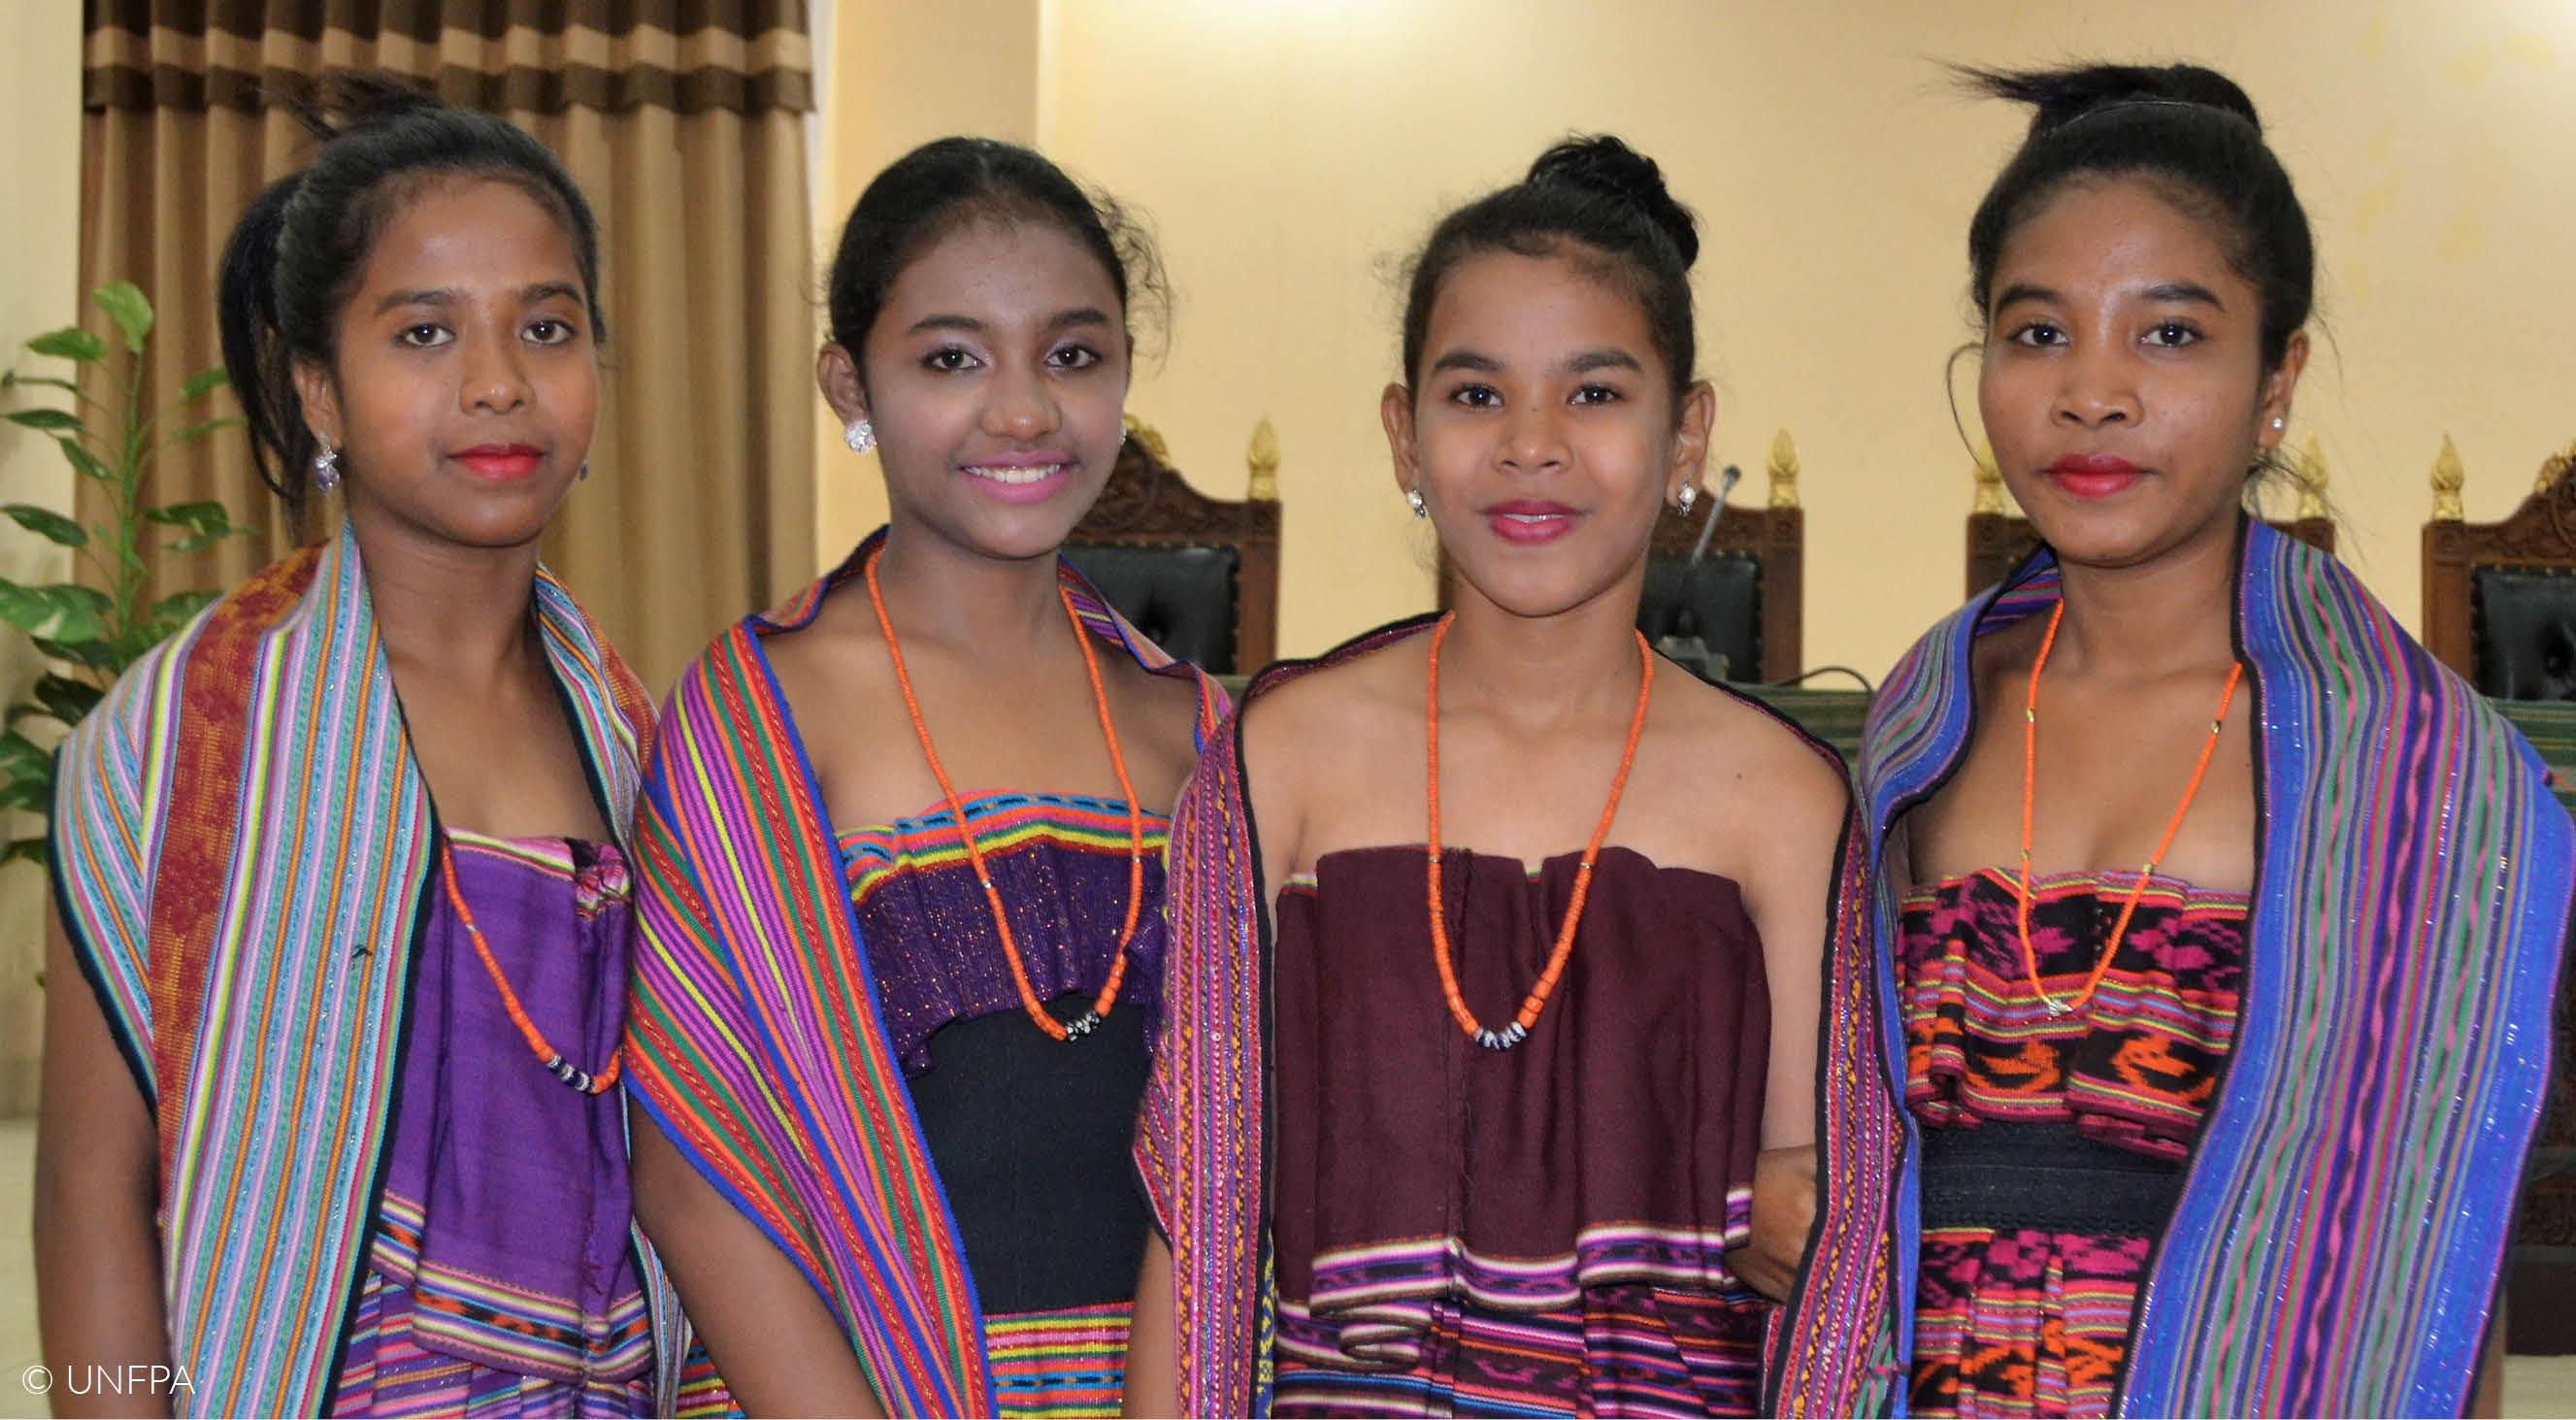 Papua Neuguinea, Timor-Leste: Antigewalt-Projekt